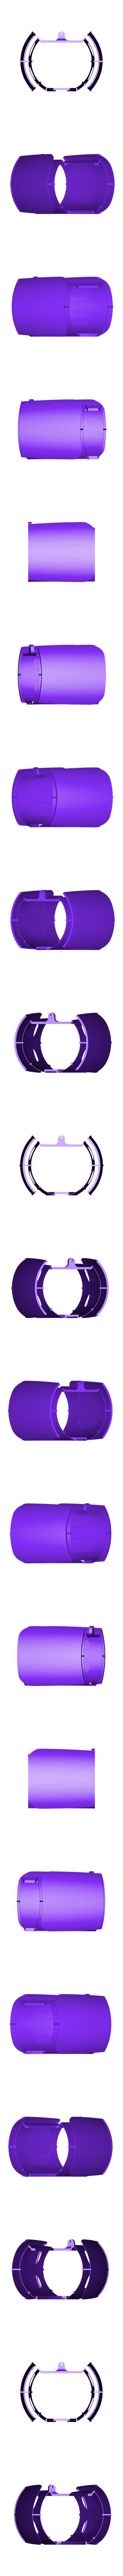 zep02.stl Download free STL file Battle zeppelin lamp • 3D print design, vd_max